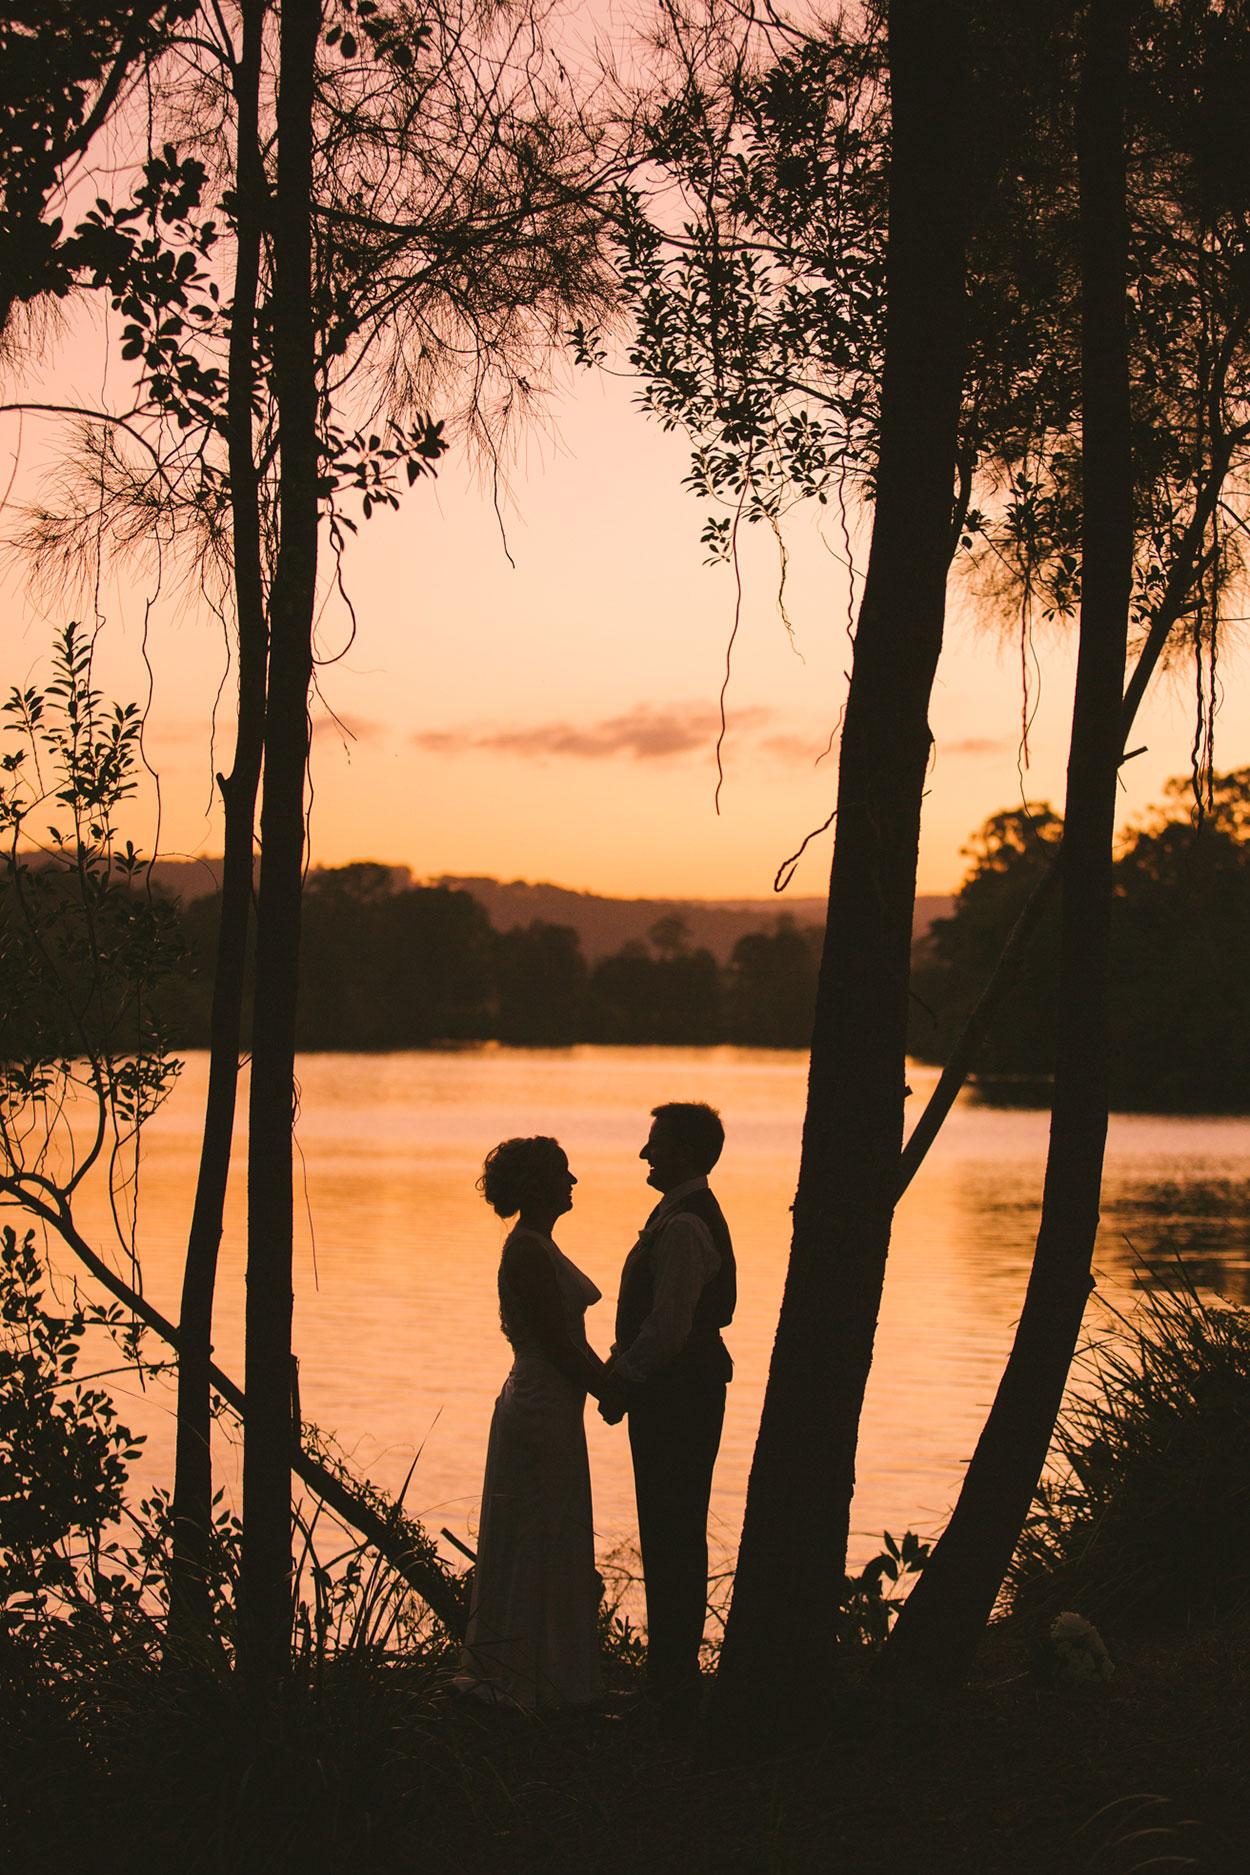 sunshine-coast-wedding-photographers-noosa-maleny-mooloolaba-maroochydore-glasshouse-mountains-hinterland-best-eco-friendly-photos-brisbane-queensland-australia-040.jpg